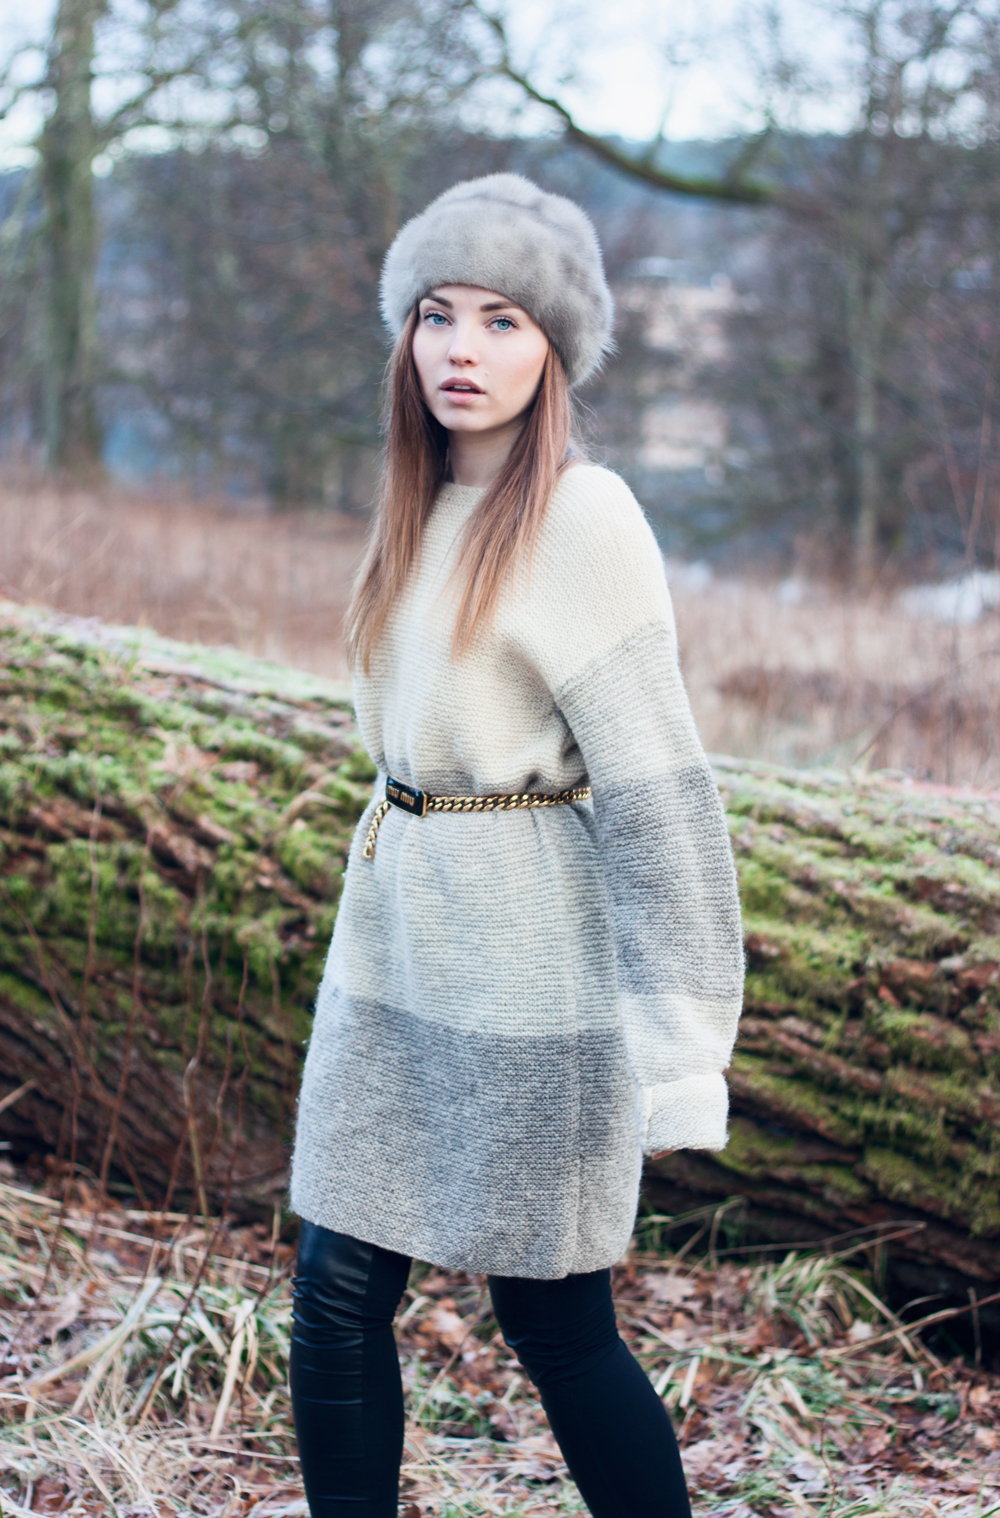 Knits, Nääs Castle, Nääs Slott, Fur, Miu Mu Belt, Sweden, Gothenburg Nature